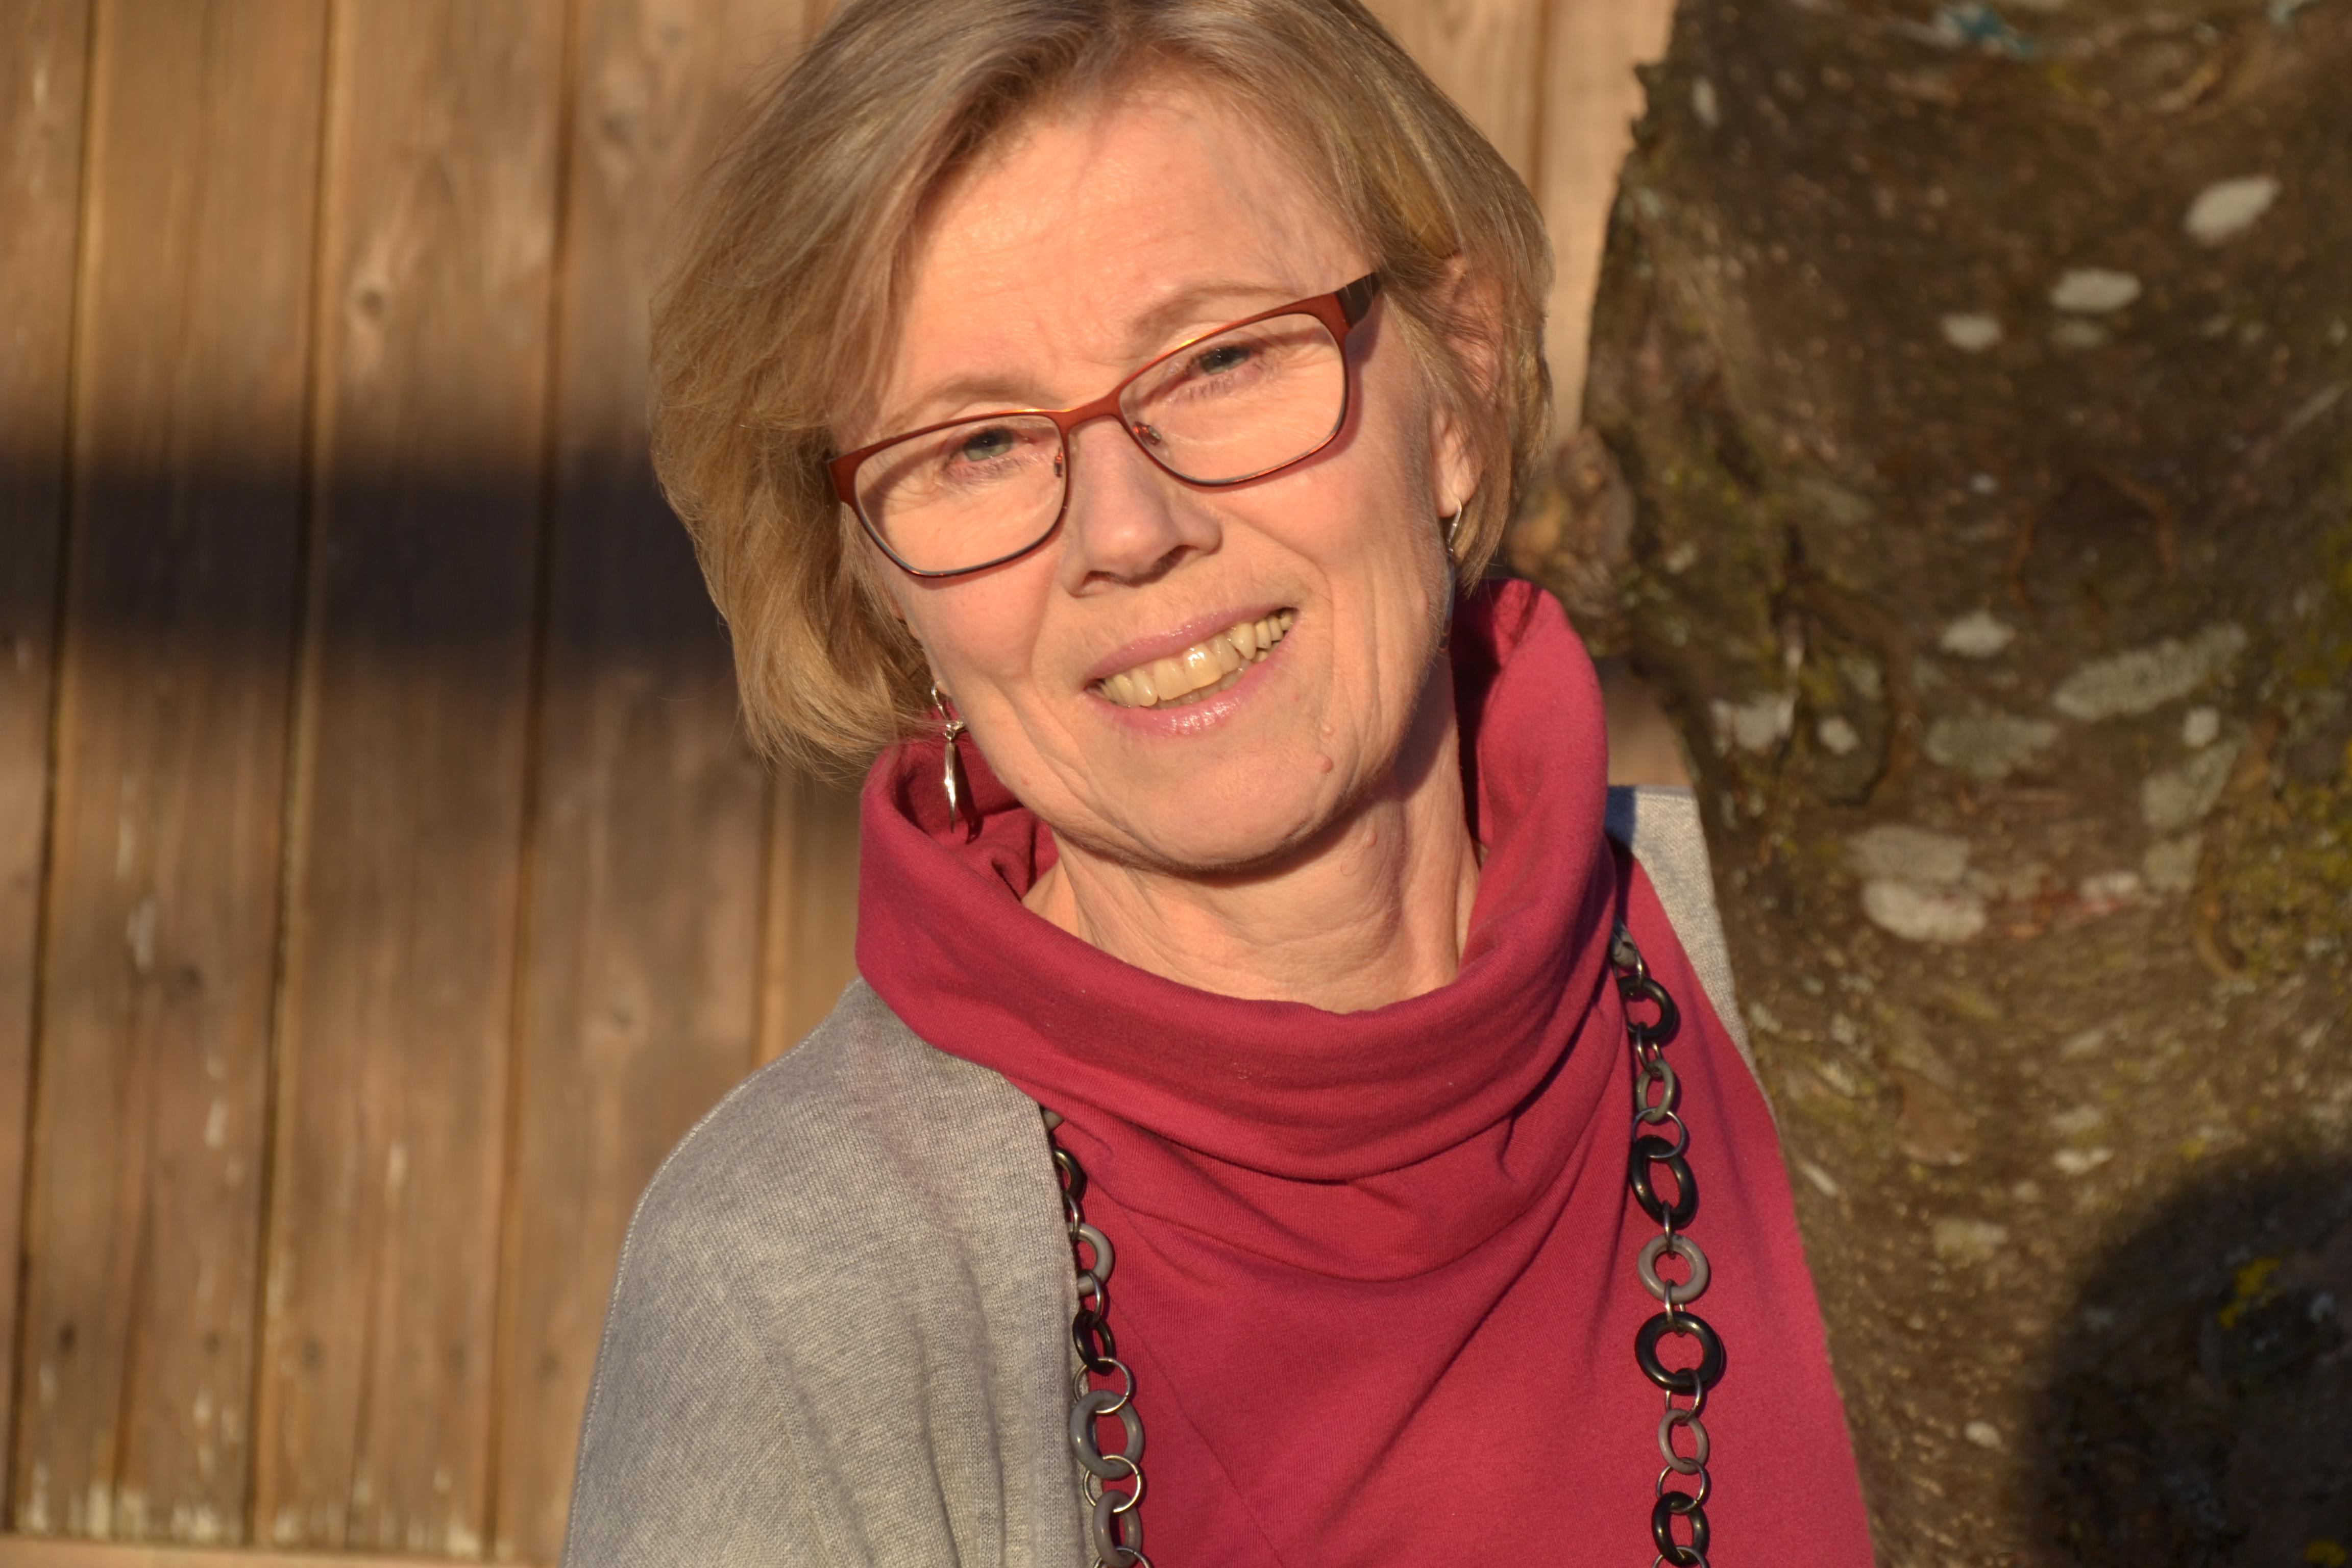 Wo frauen kennenlernen in seebach - Berg bei rohrbach flirten